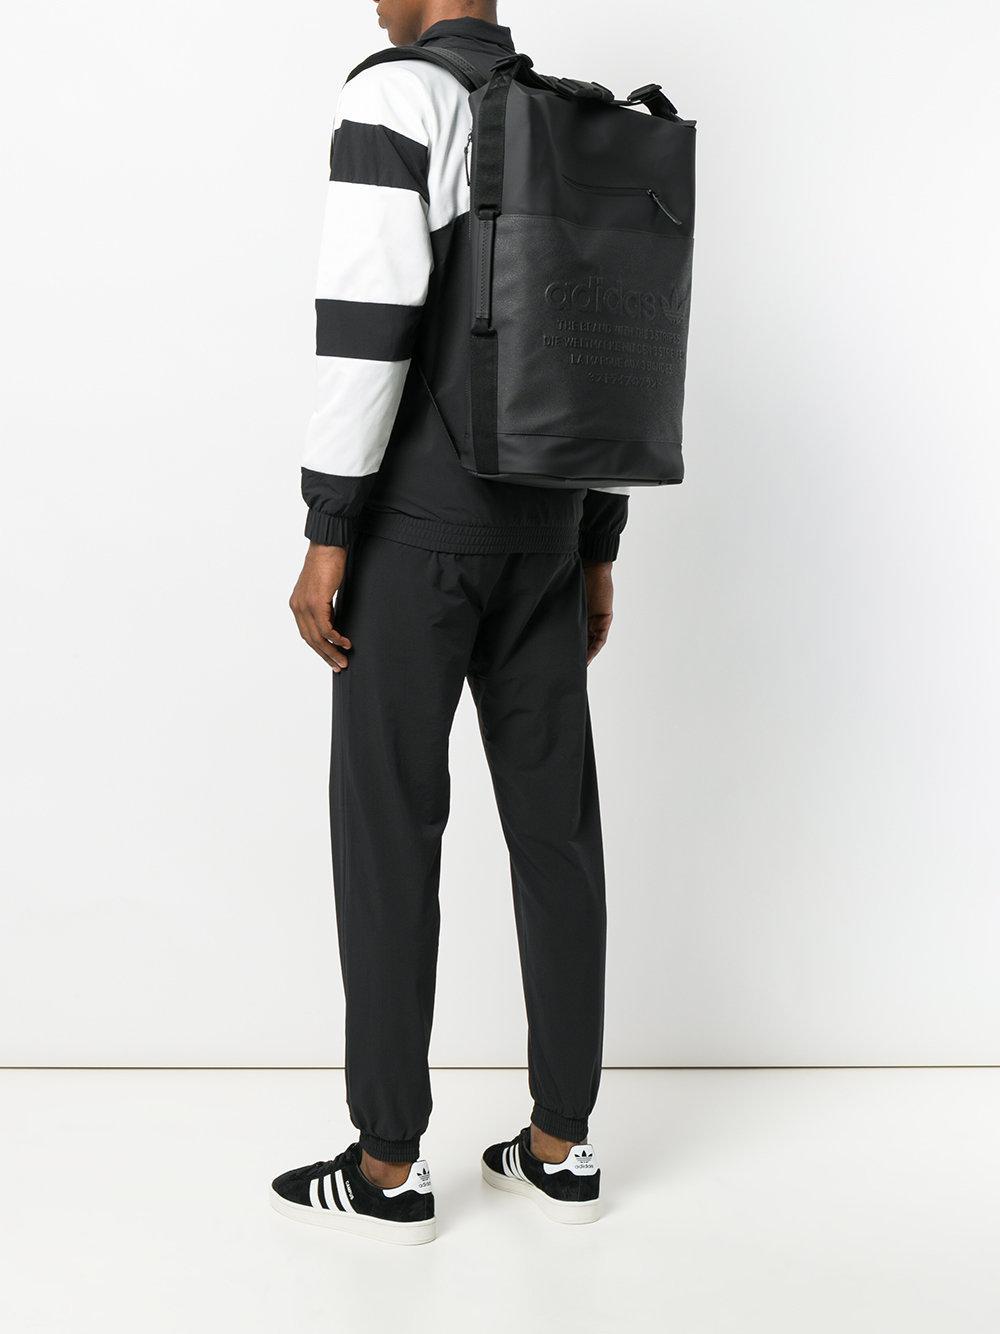 adidas nmd backpack medium - 56% OFF